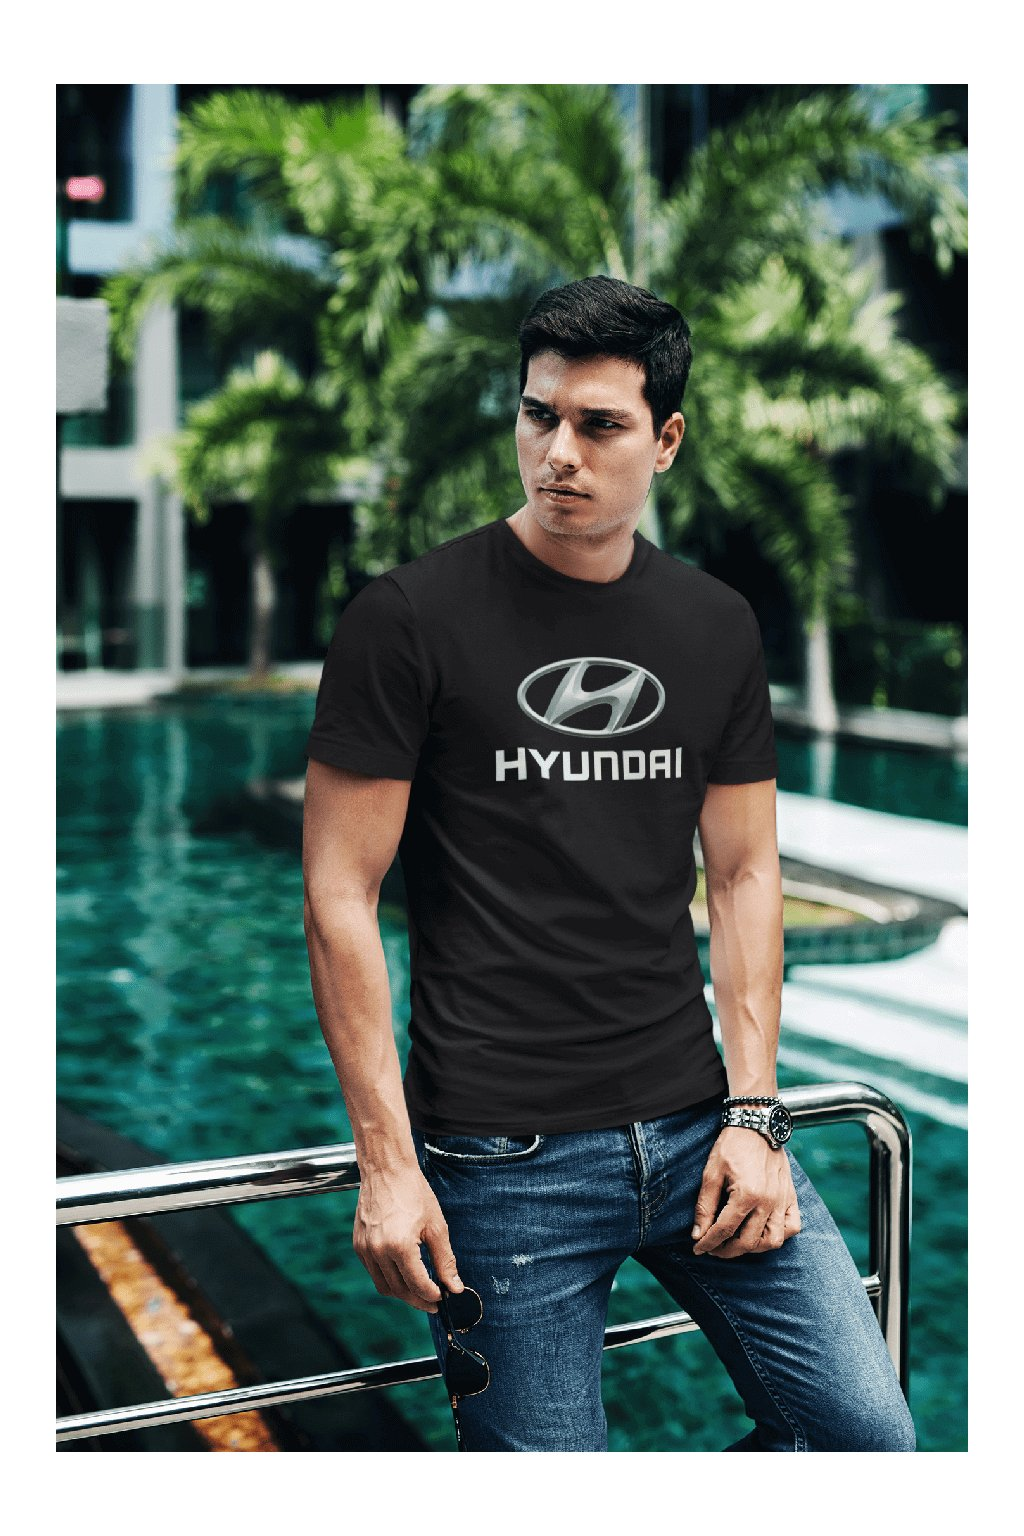 t shirt mockup of a fashionable man posing by a pool 430 el (19)